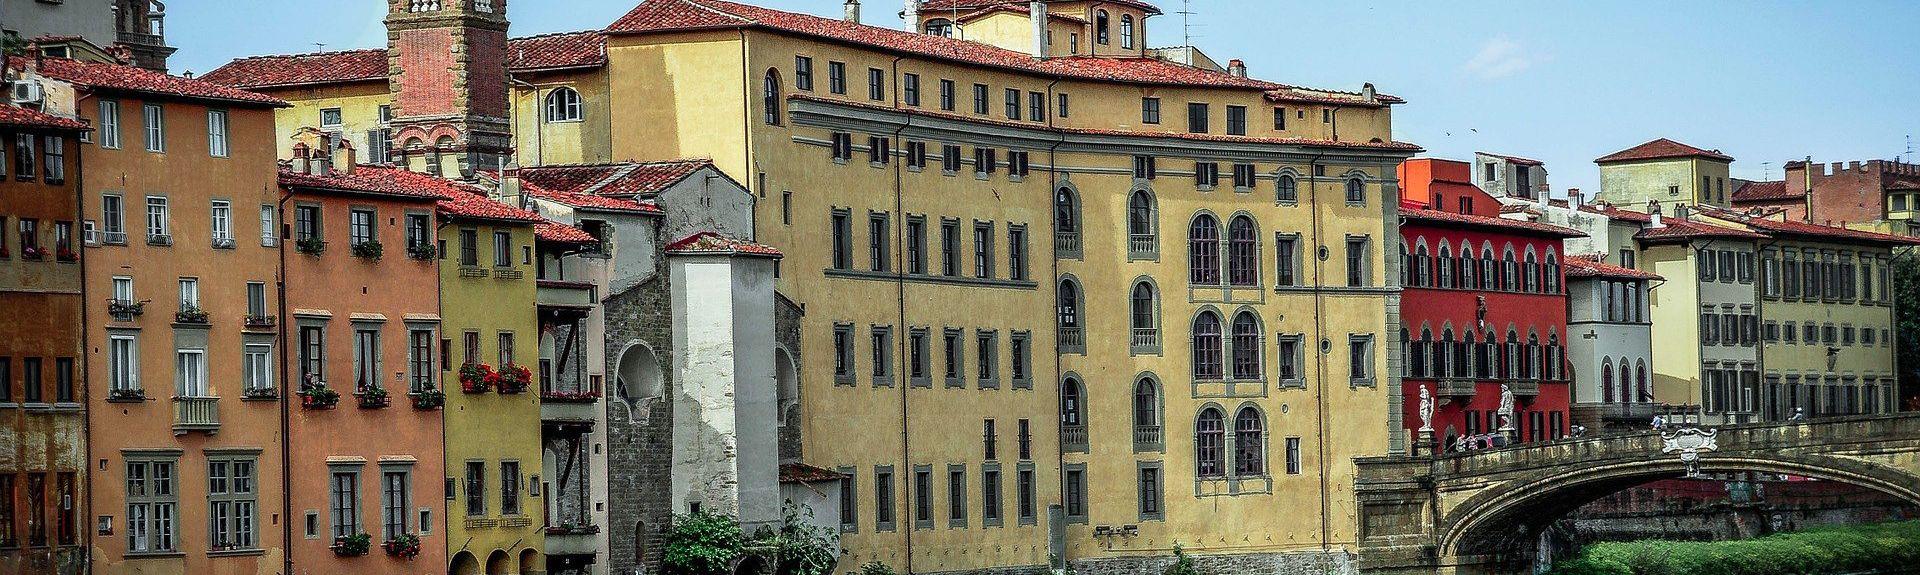 SS. Annunziata, Florence, Toscane, Italië